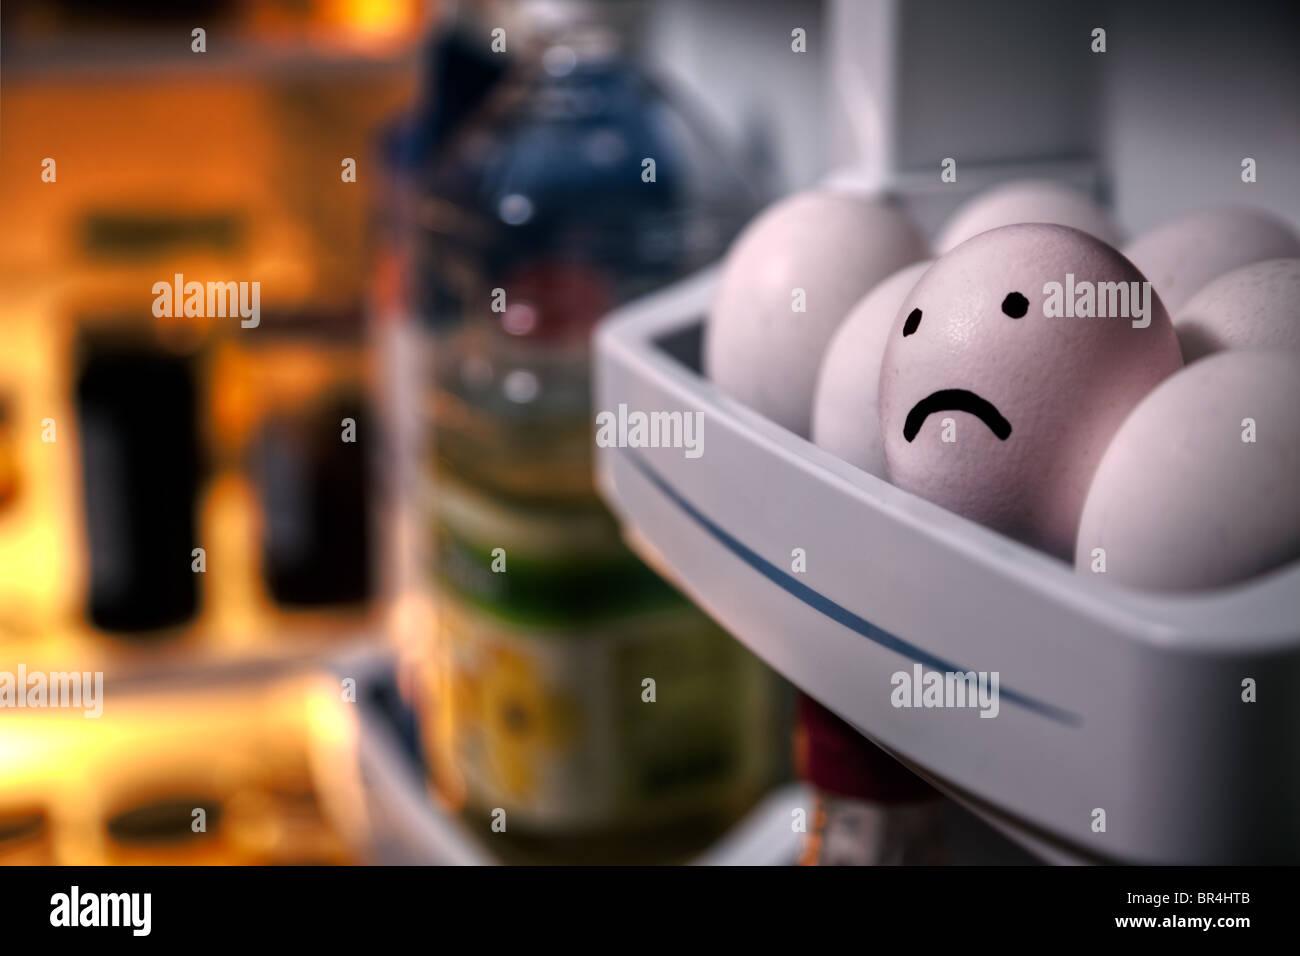 Sad egg - Stock Image